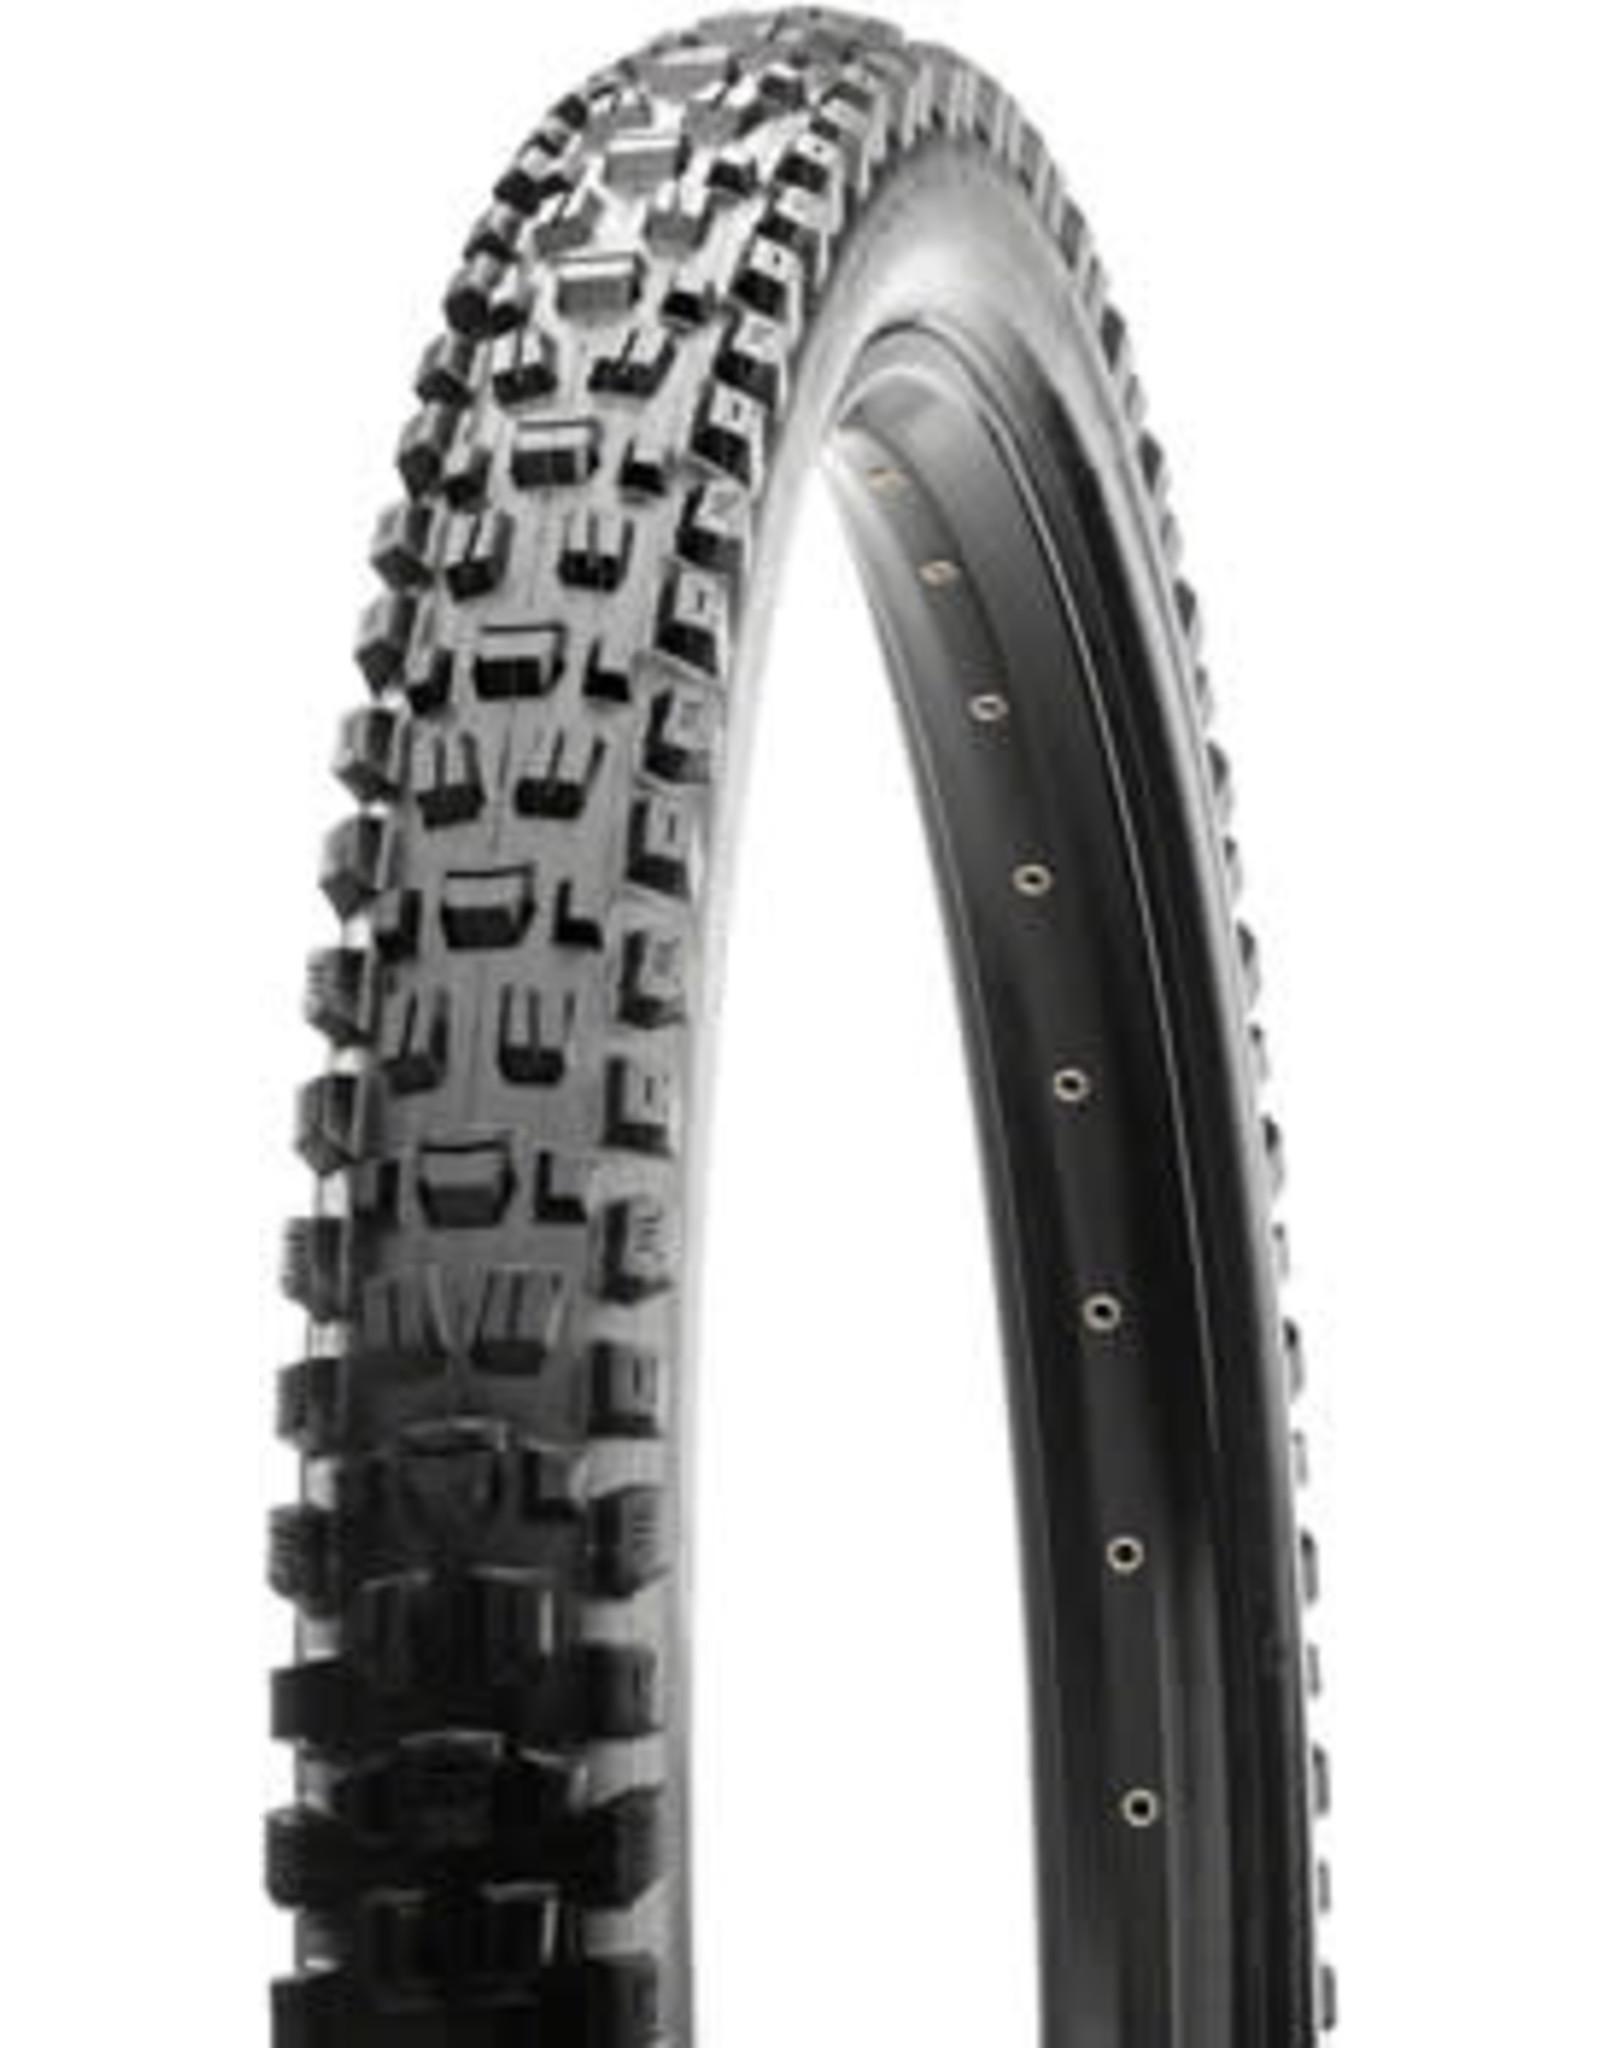 Maxxis Maxxis Assegai Tire - 29 x 2.6, Tubeless, Folding, Black, 3C Maxx Terra, EXO+